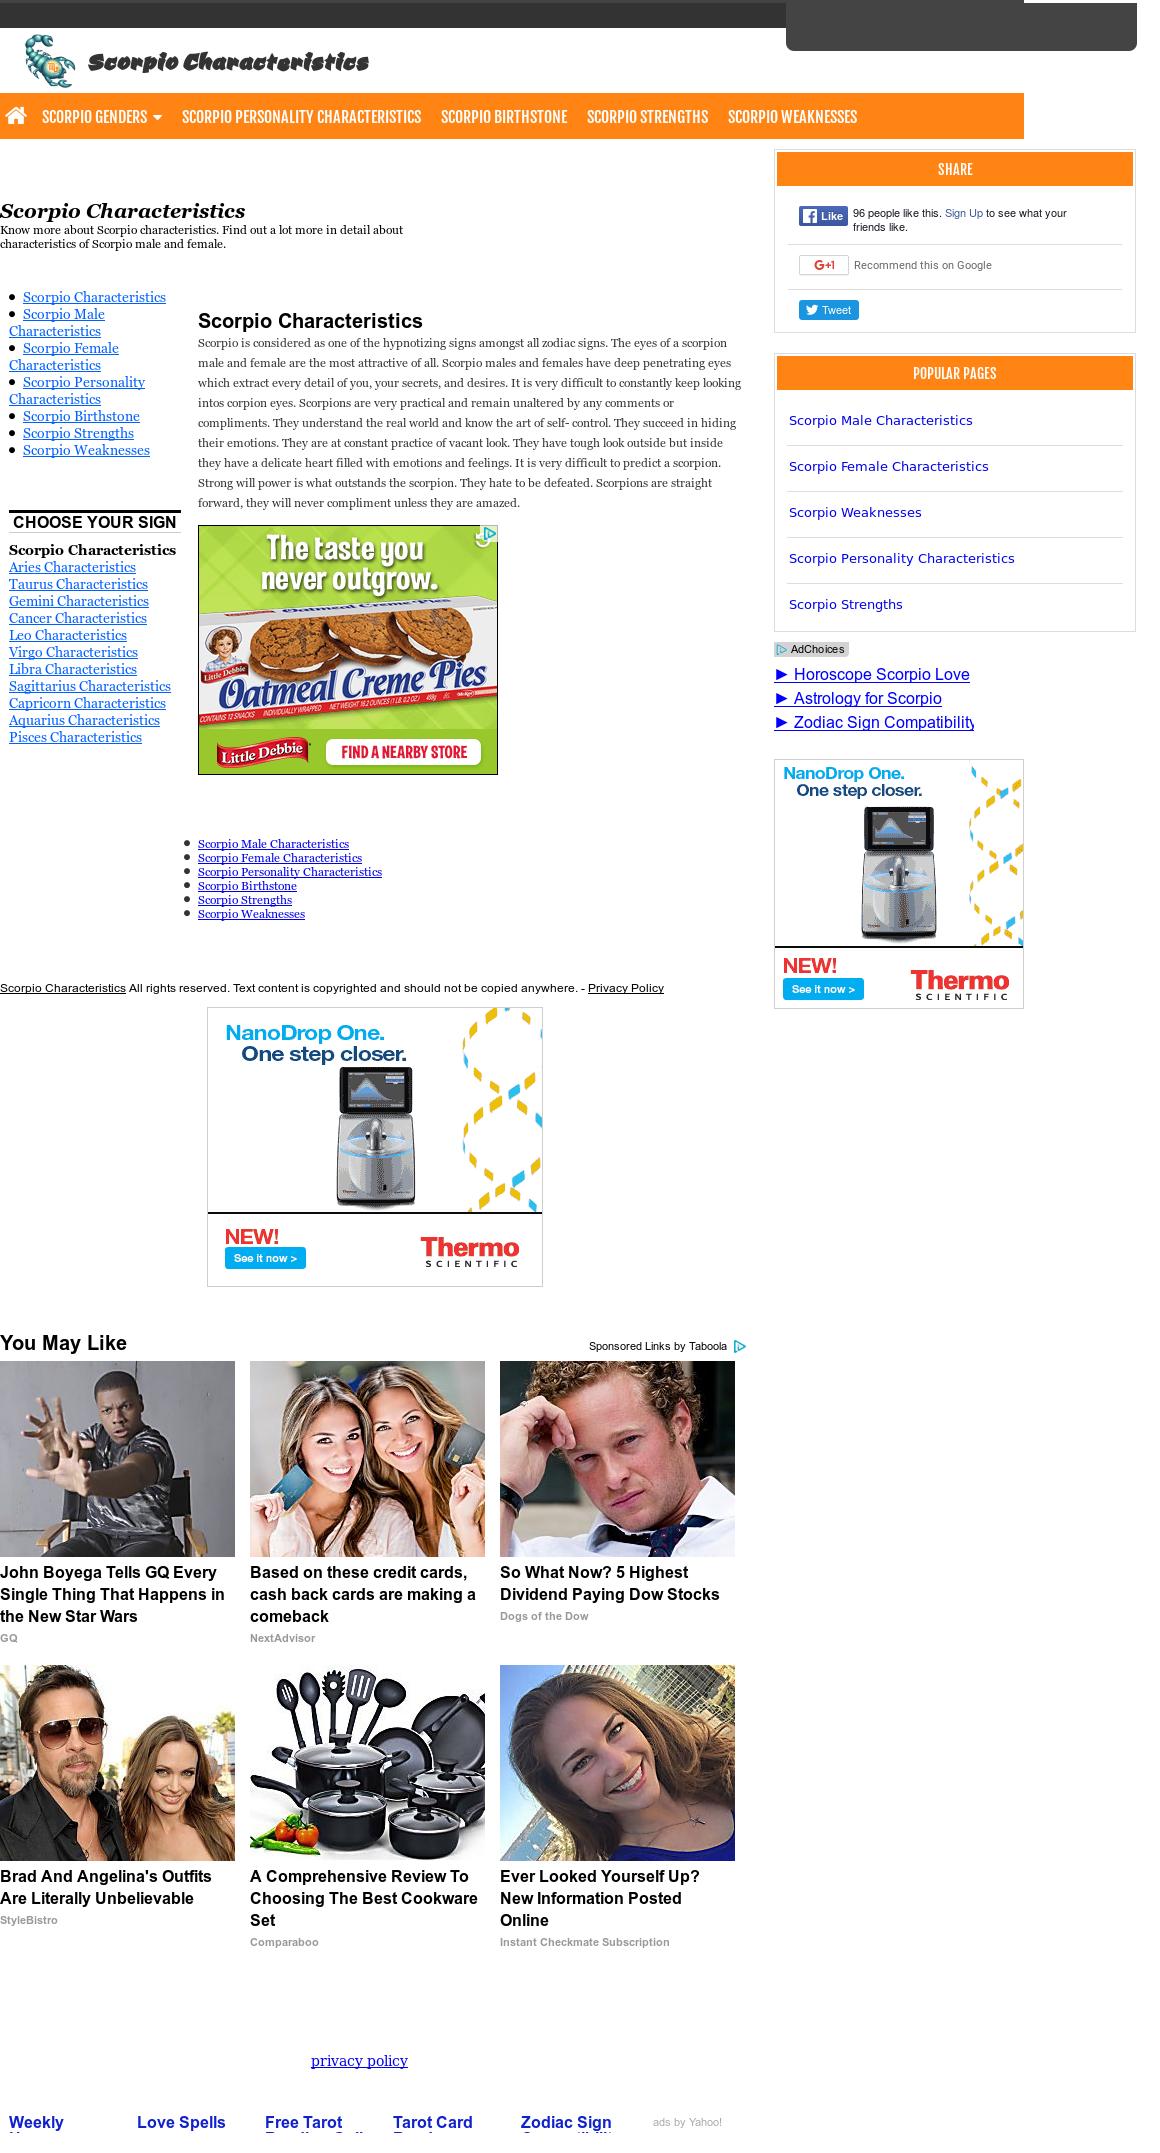 Scorpio Characteristics Competitors, Revenue and Employees - Owler